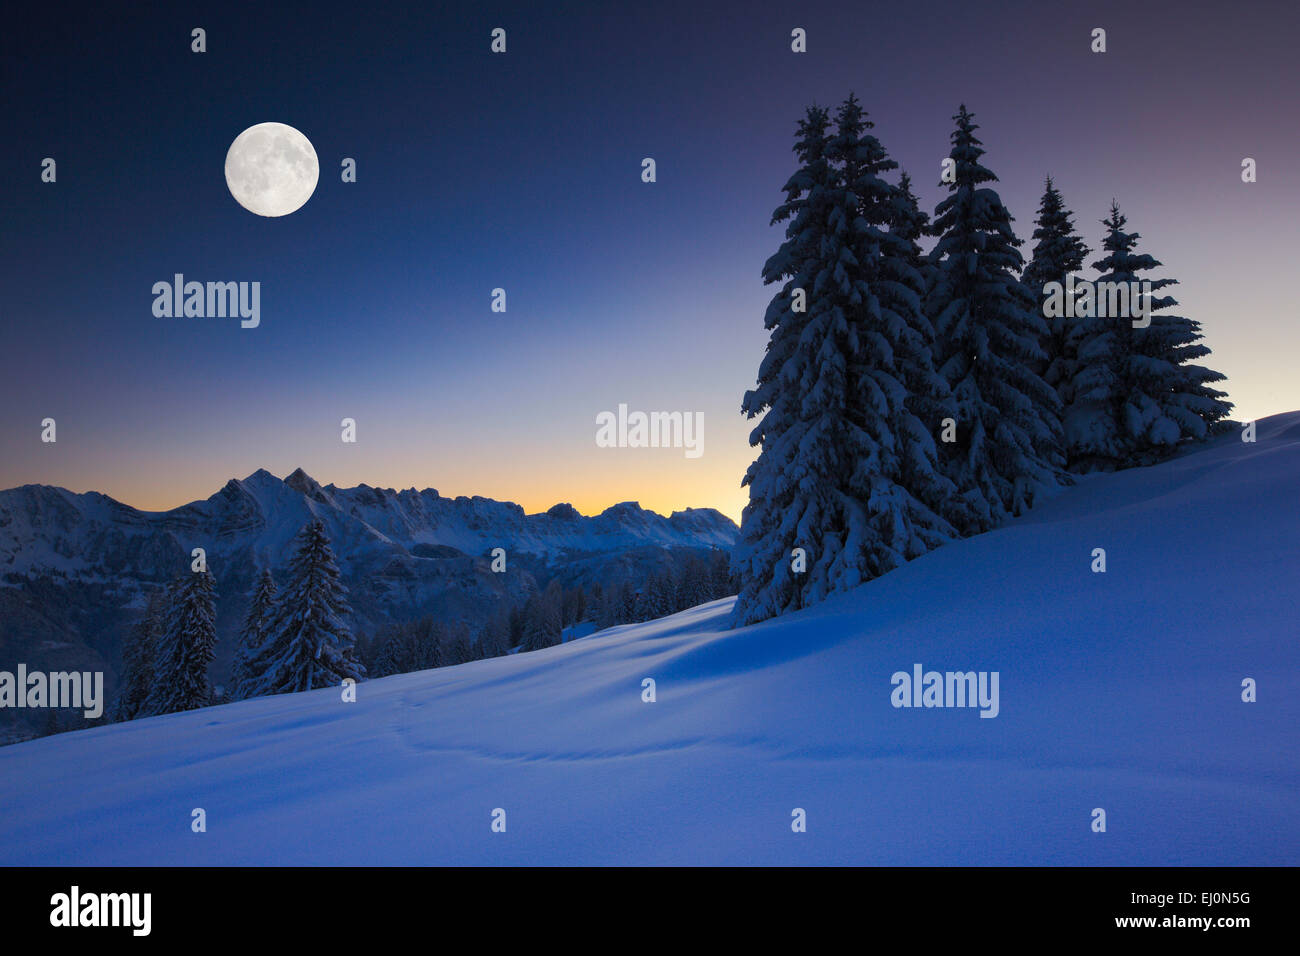 Alpi, Alvier, Alviergruppe, Alvier gamma, visualizzare, albero, montagna, panorama di montagna, montagne, massiccio, Immagini Stock